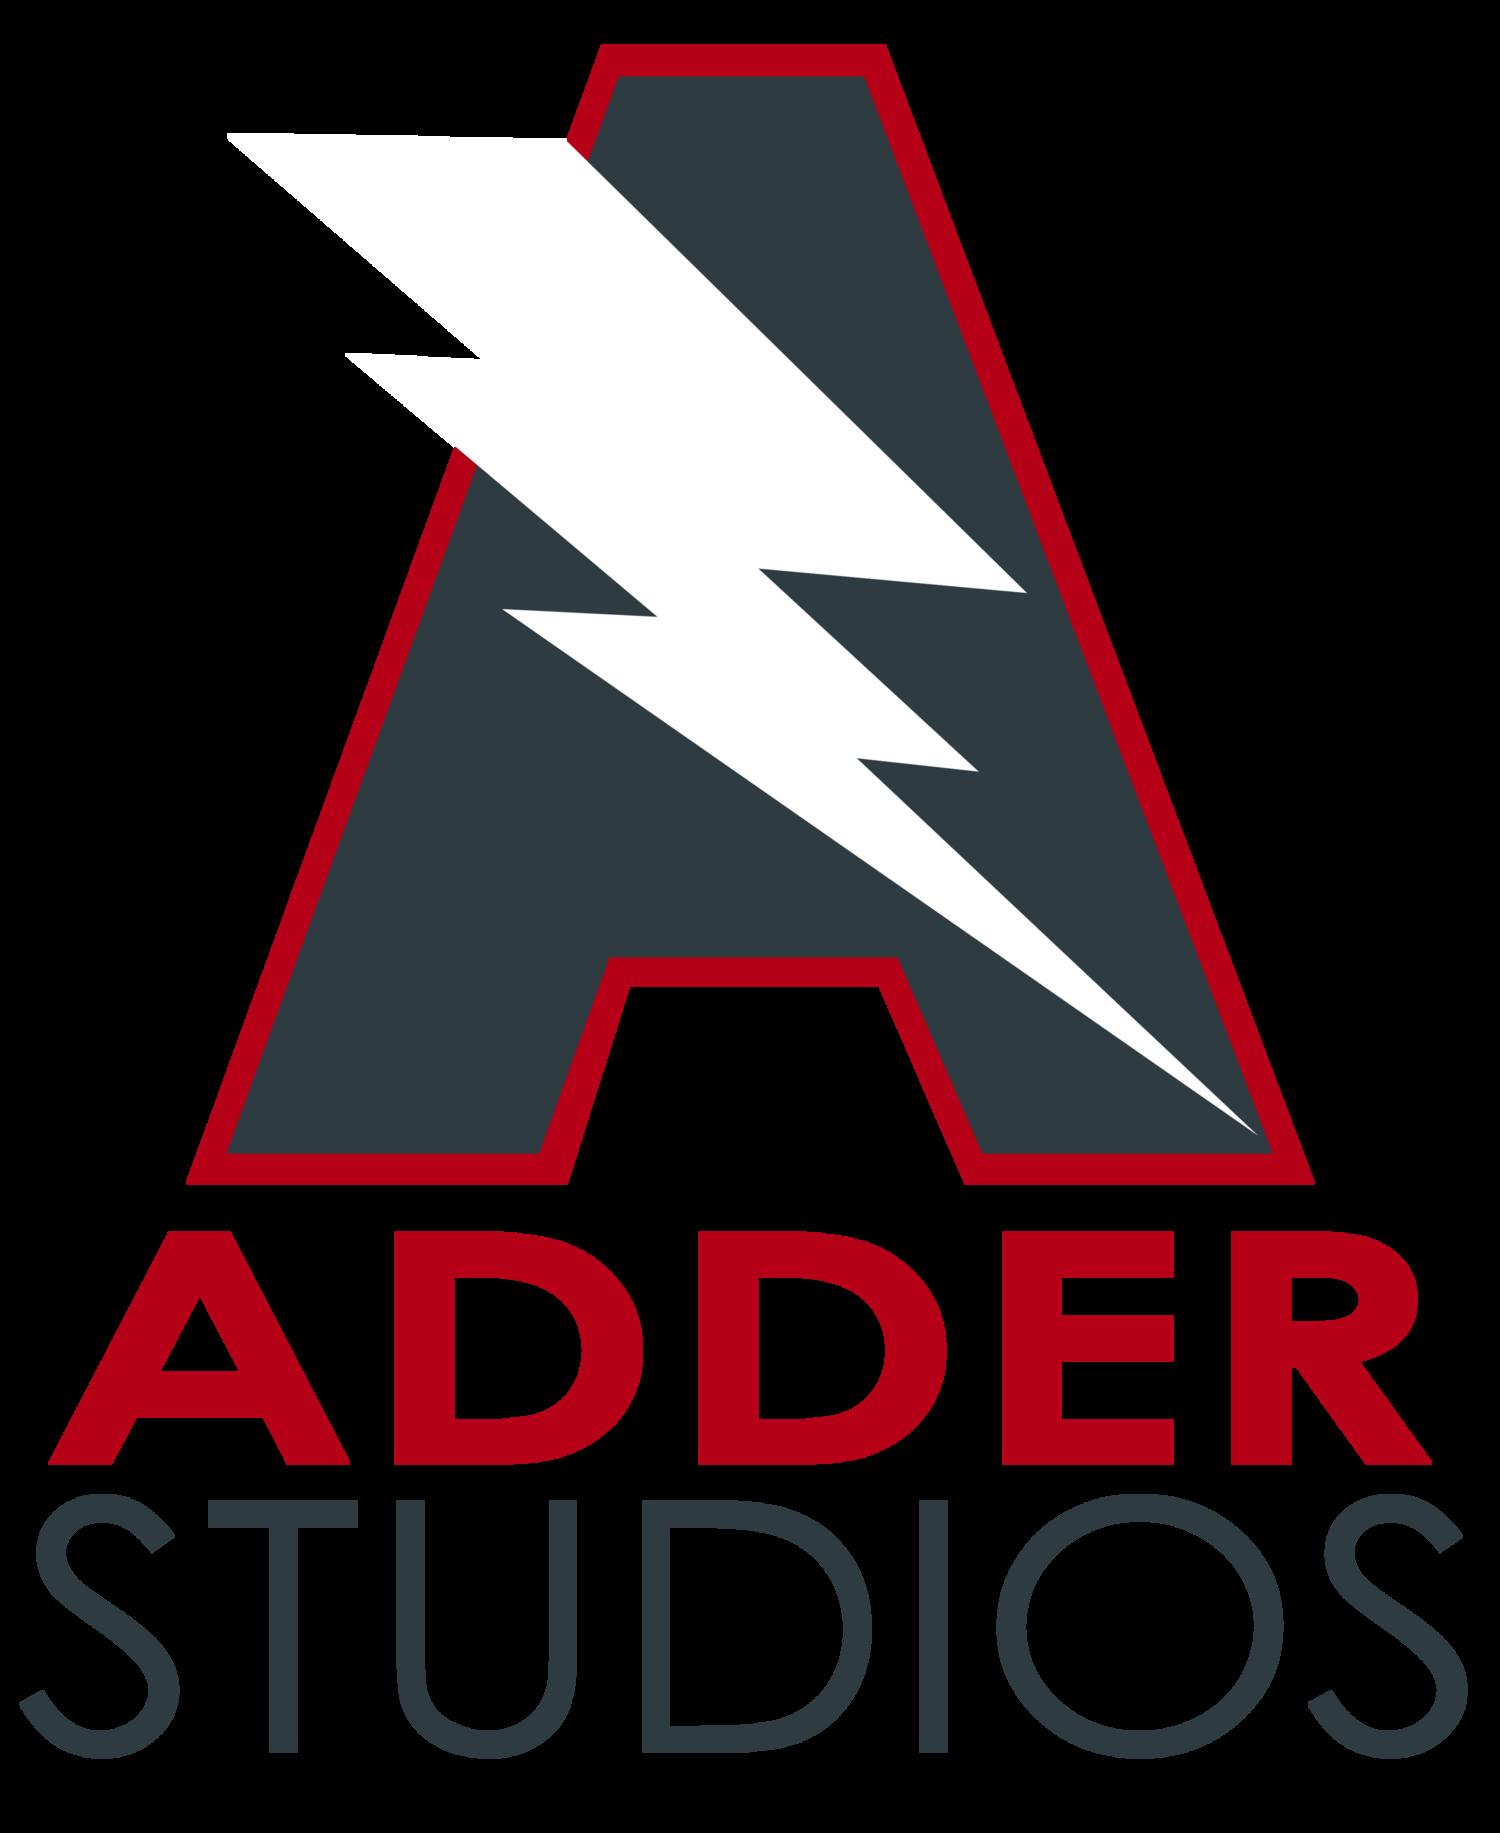 Adder Studios